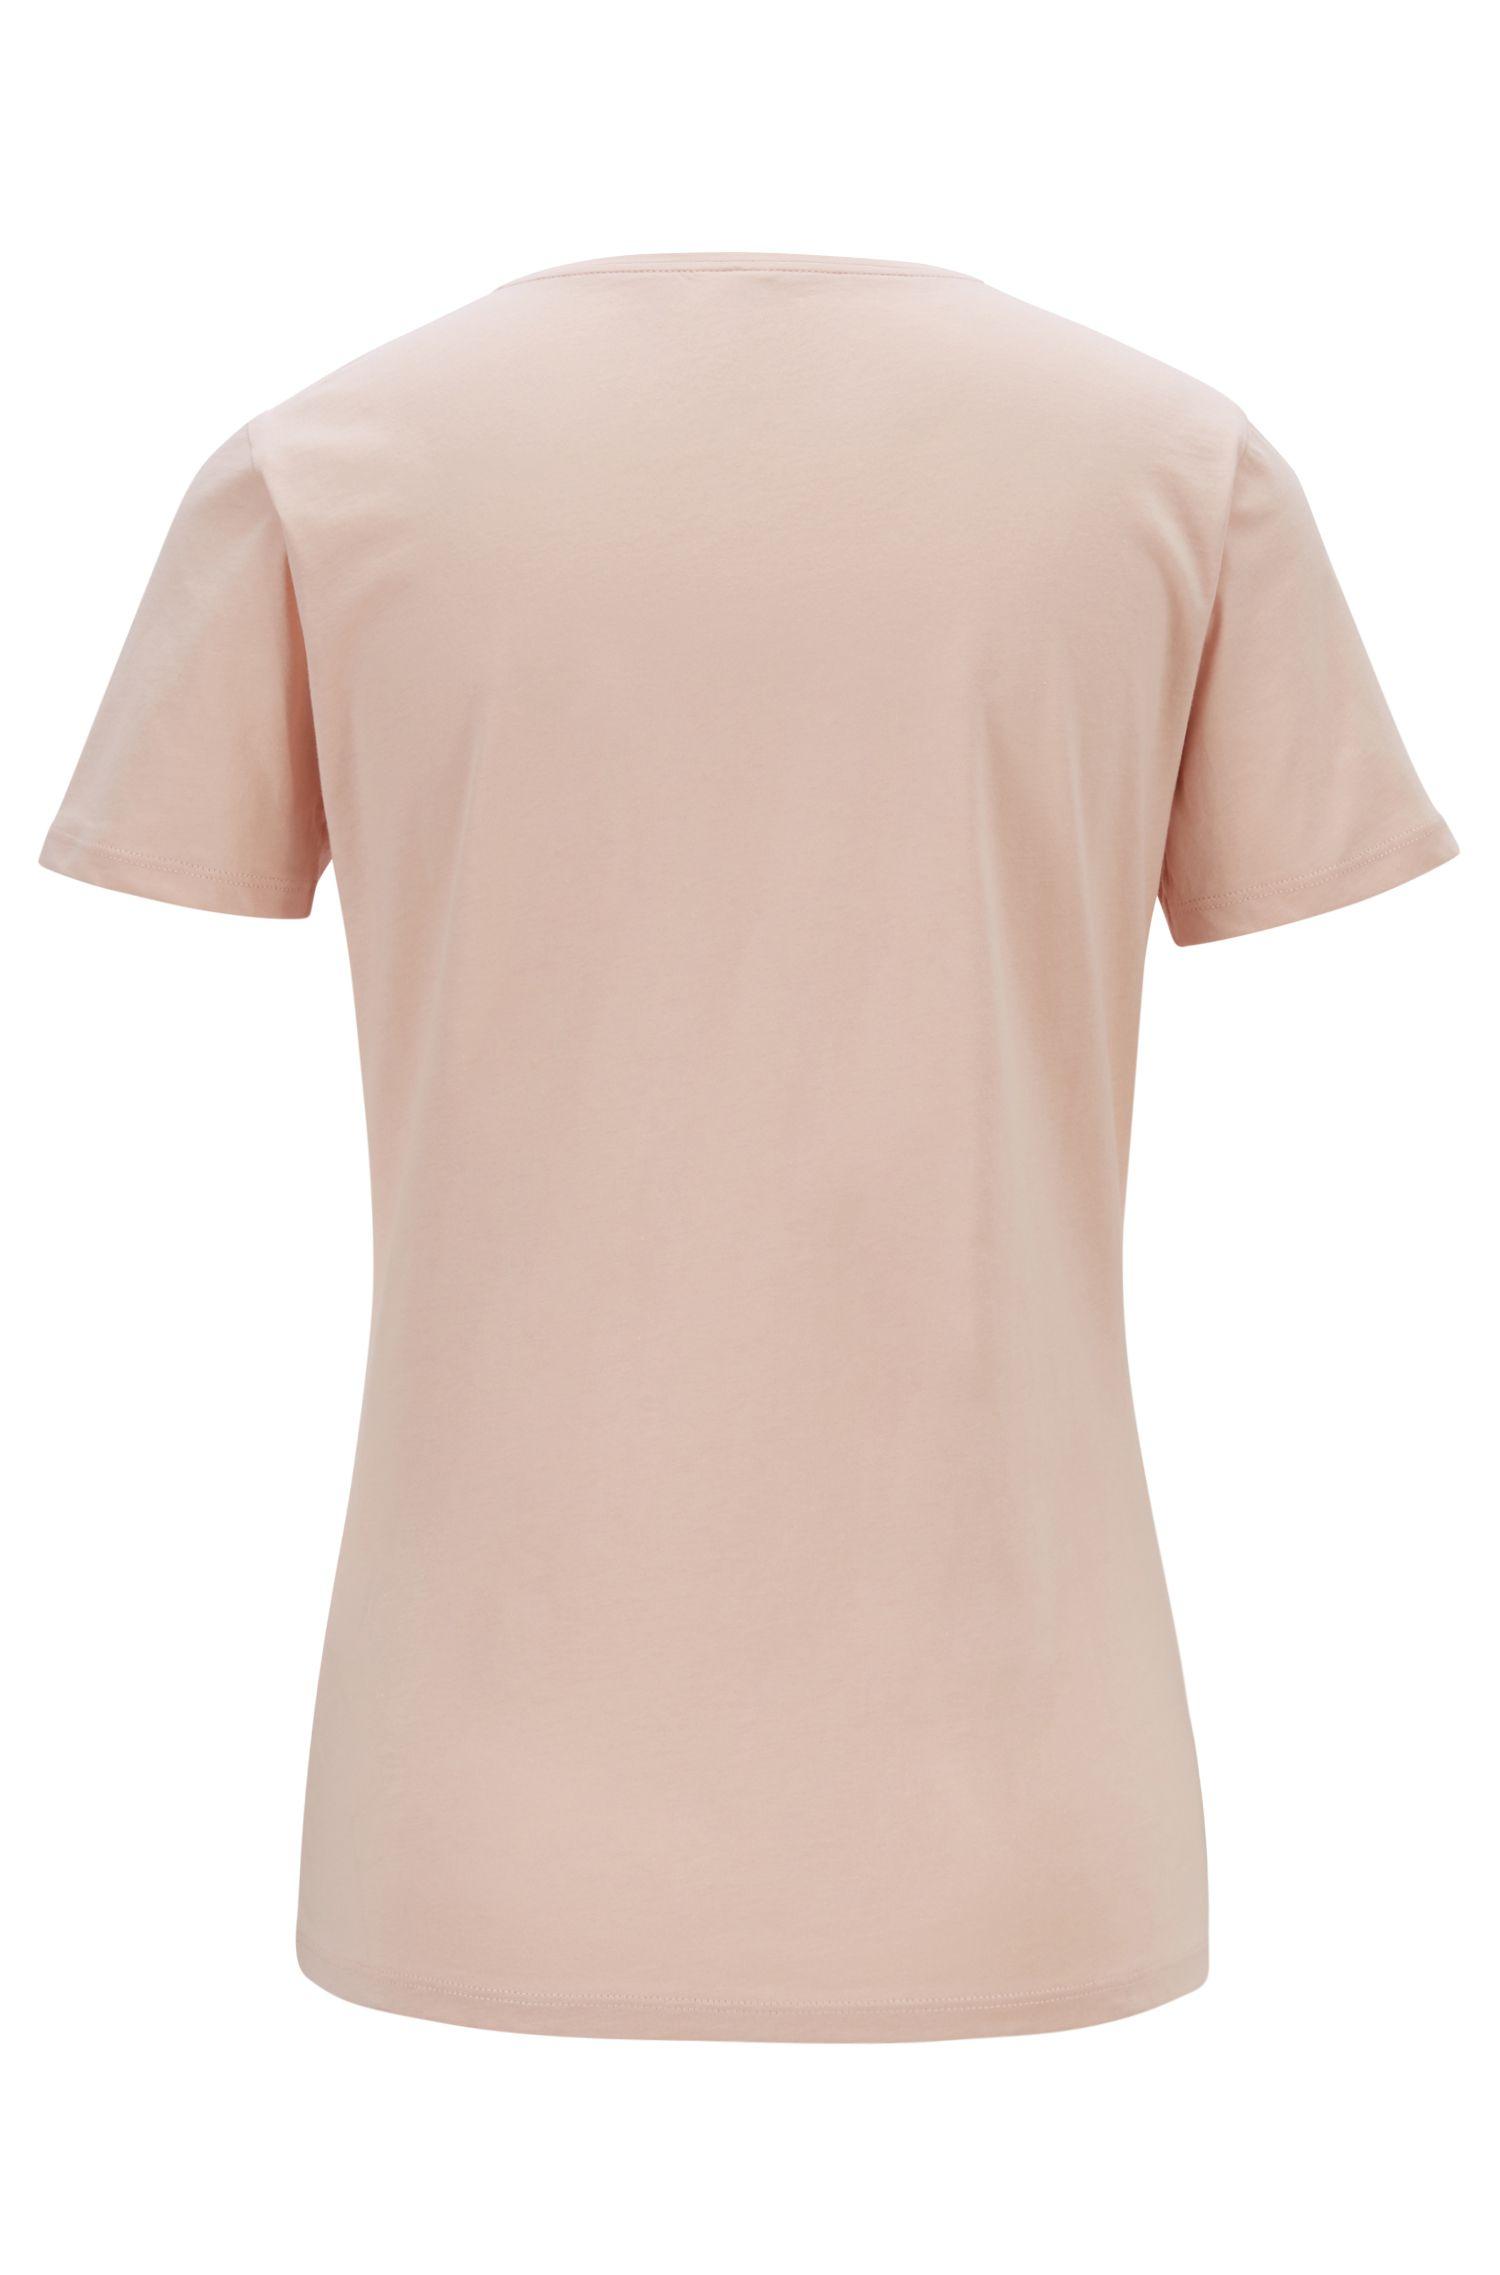 Crew-neck T-shirt with striped logo artwork, light pink